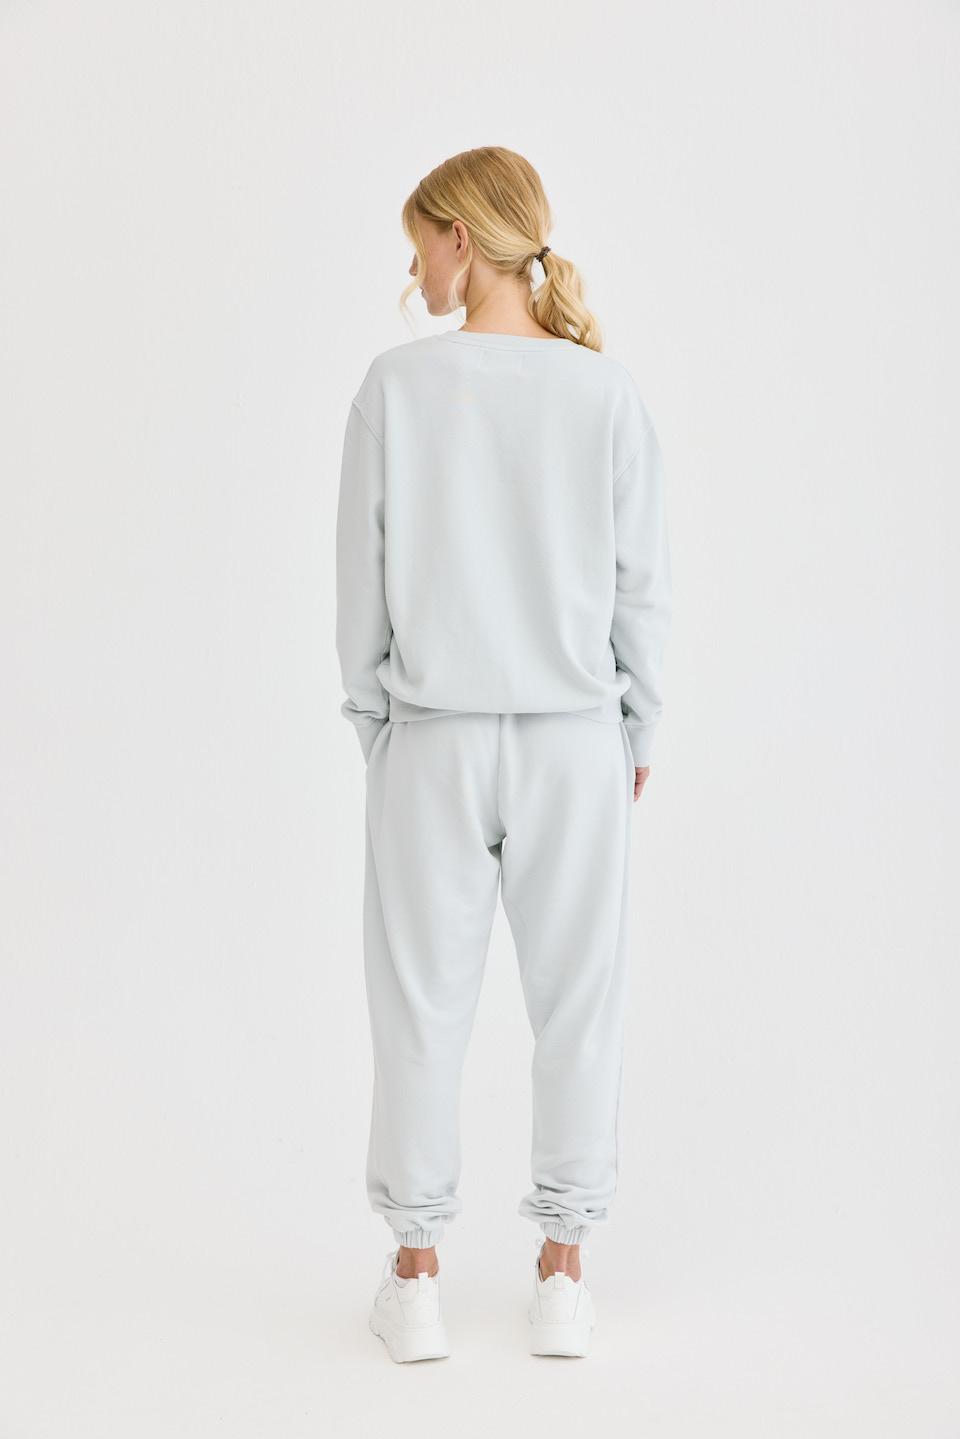 CPH Sweat 3 org. cotton light grey - alternative 1